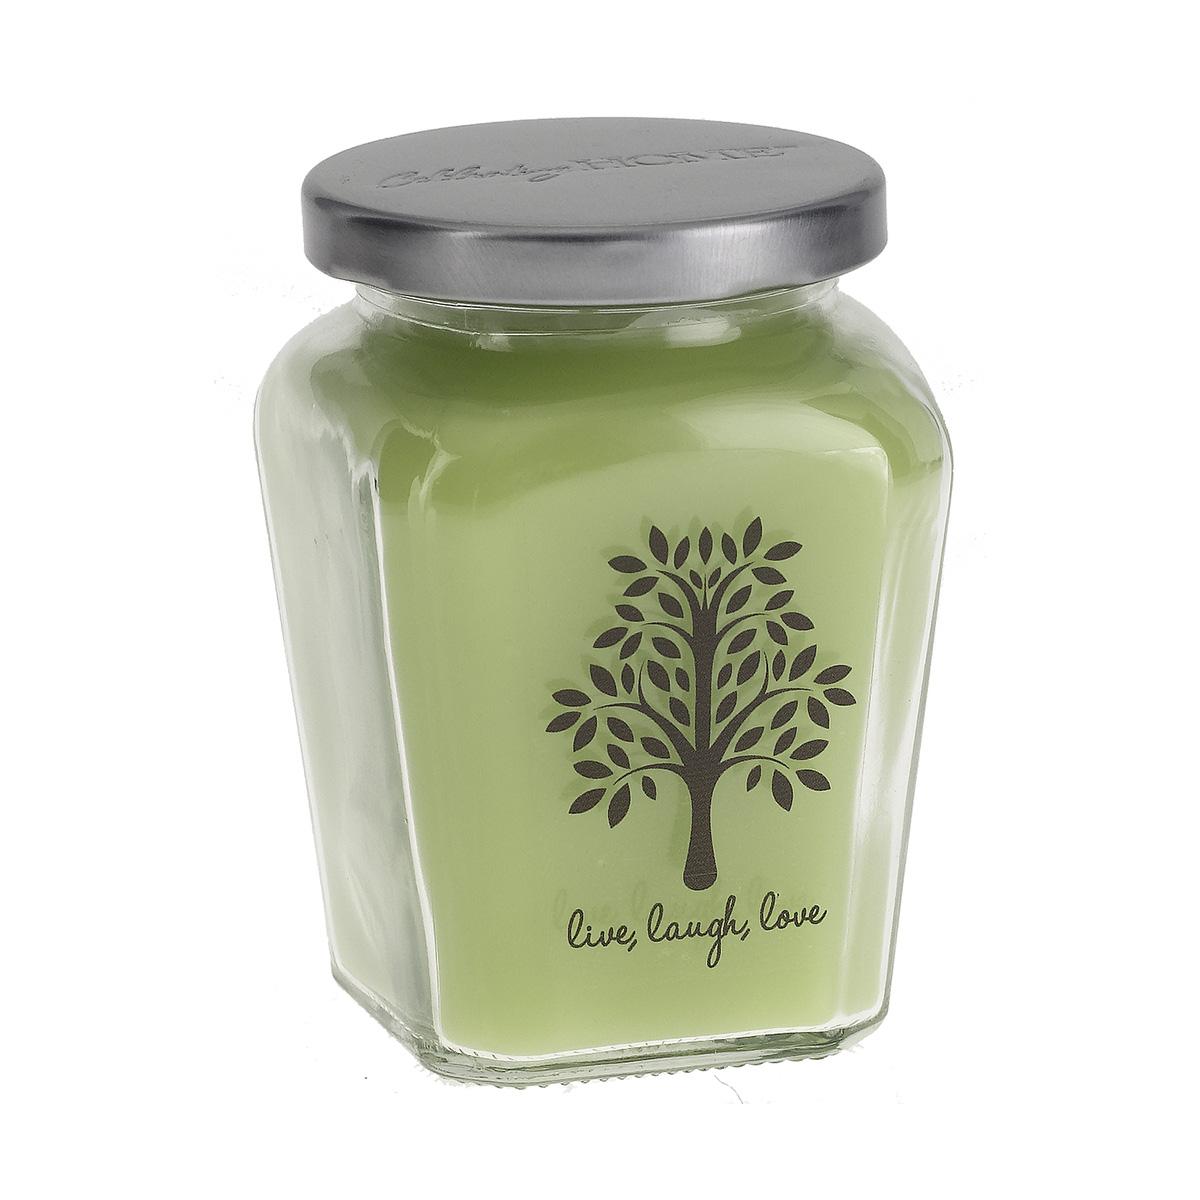 Petite Jar Candle - Lime Colada